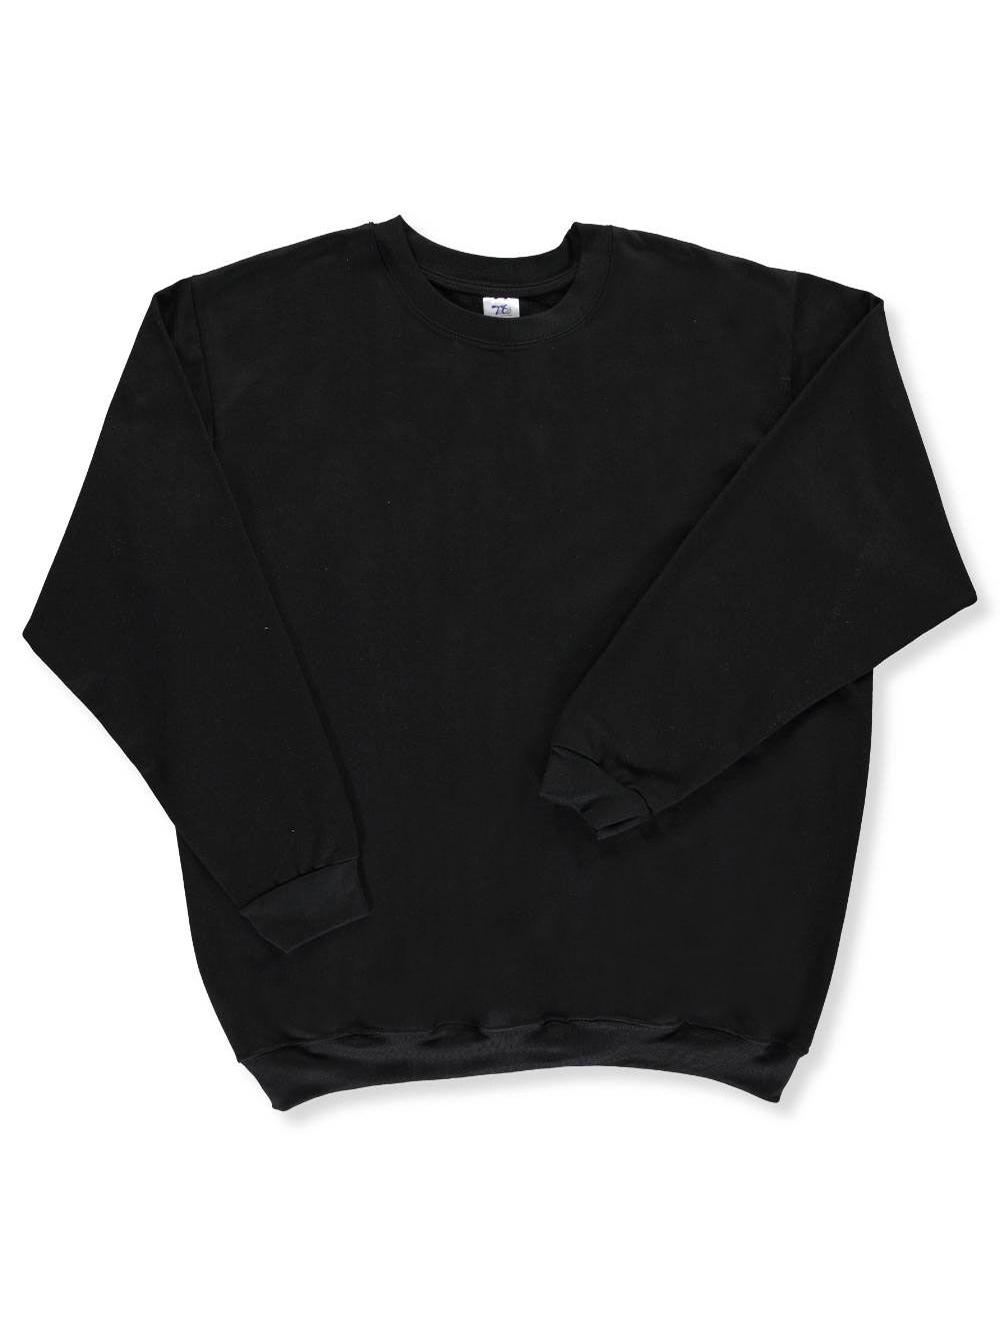 578de1c5e166 Tato Unisex Sweatshirt (Adult Sizes S – XL)